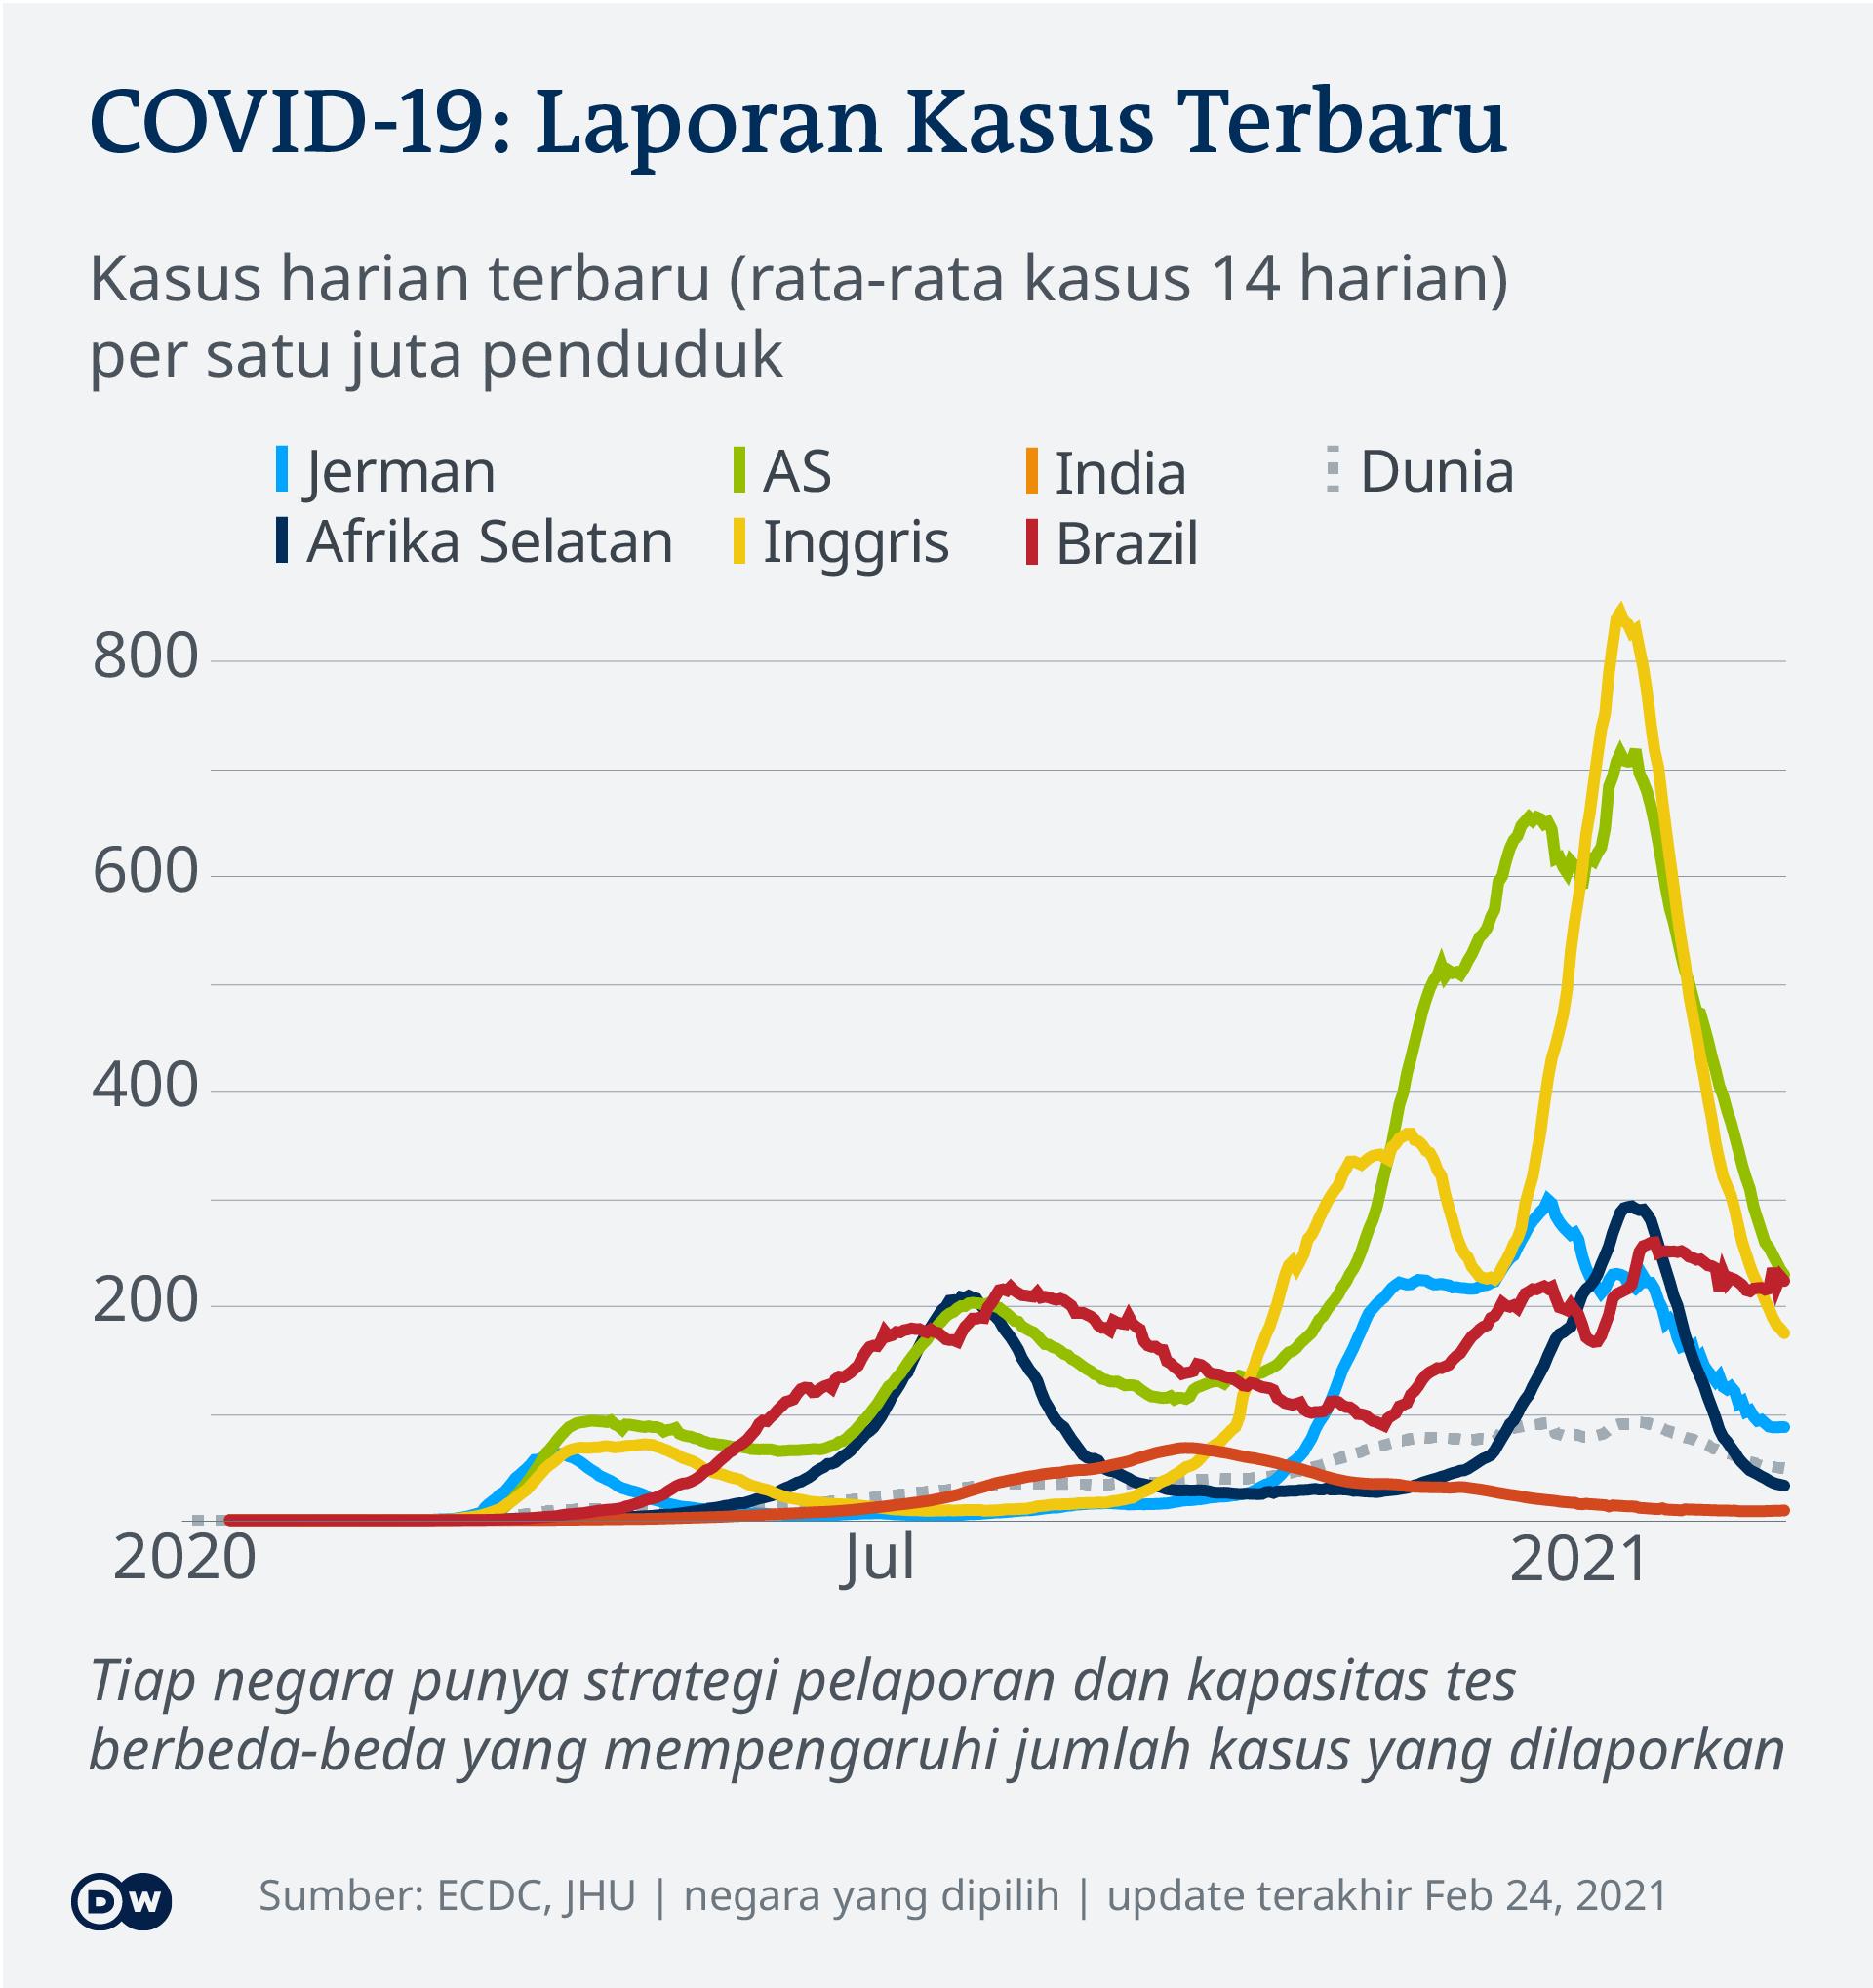 Data visualisasi COVID-19